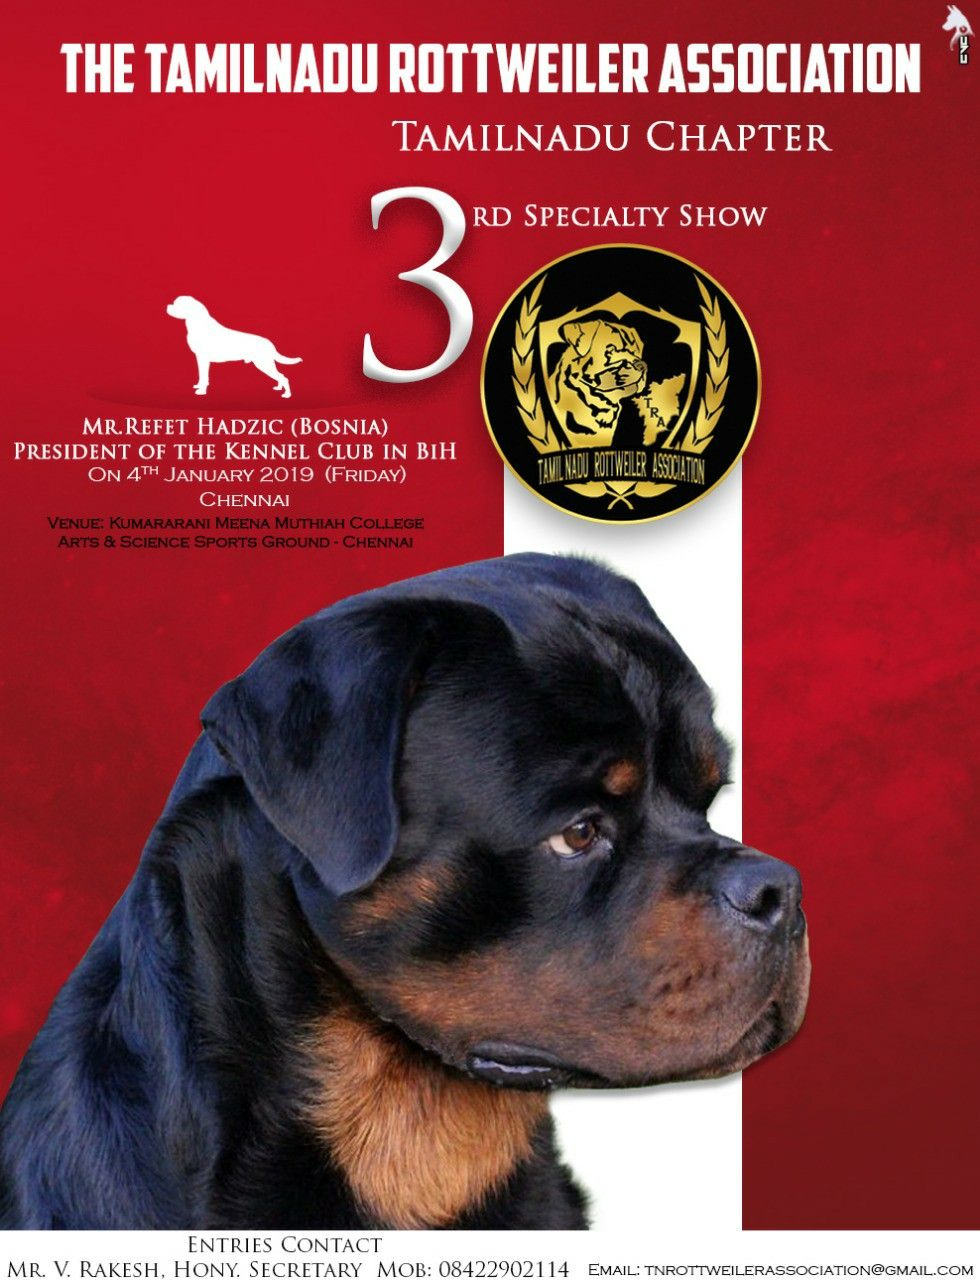 Creativebycvc Tamil Nadu Rottweiler Association New Year Kick Off The Kennel Club Science Art College Art